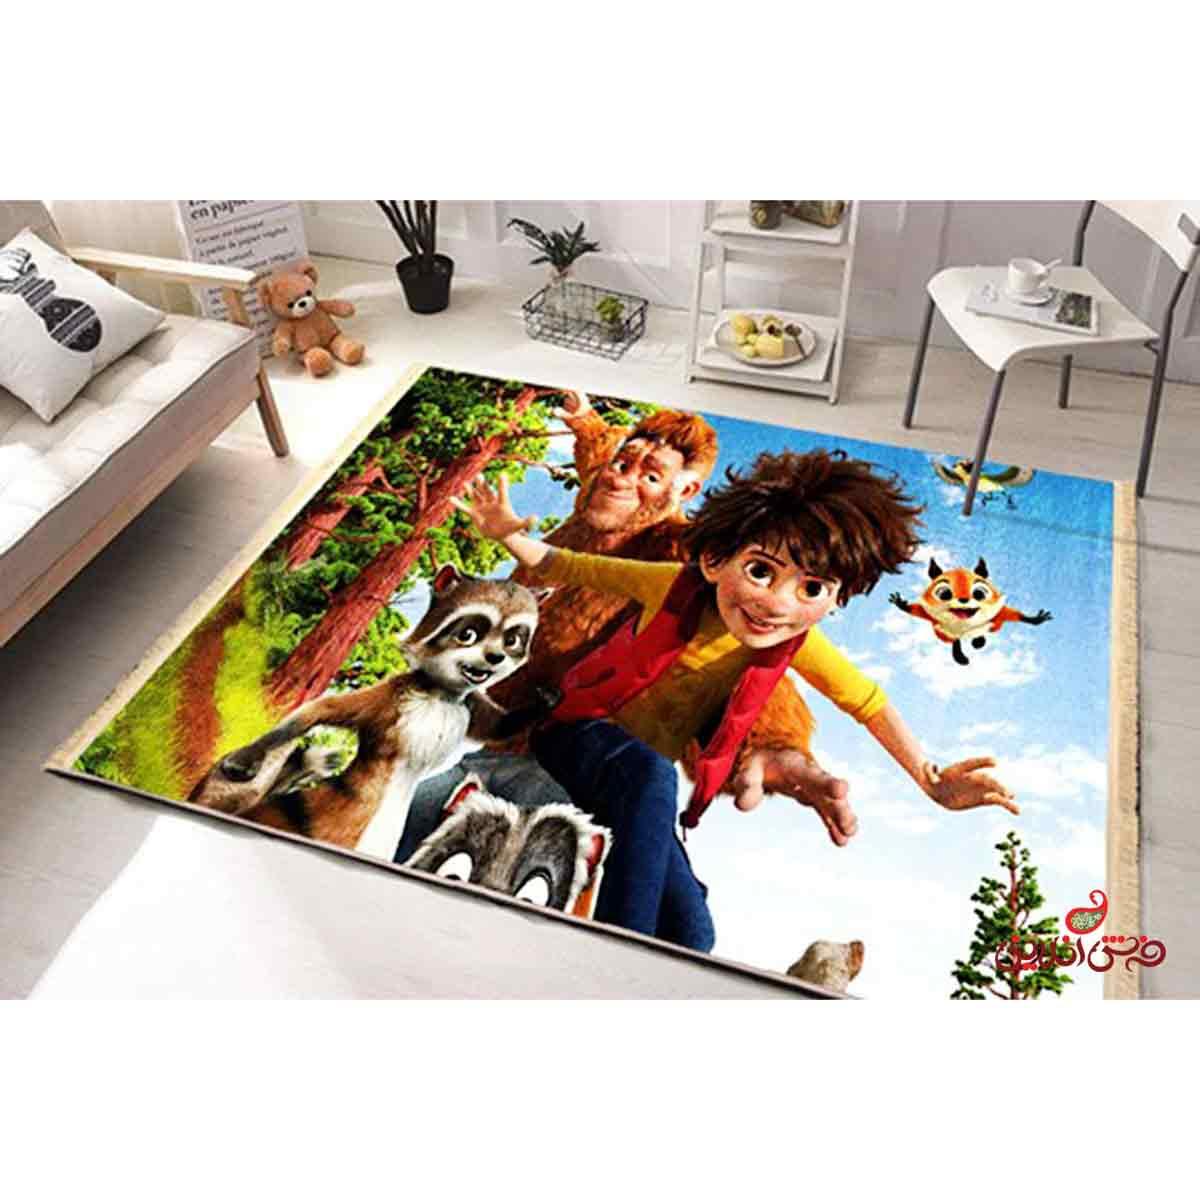 فرش ماشینی کودک کلاریس پسر پا گنده کد 100200